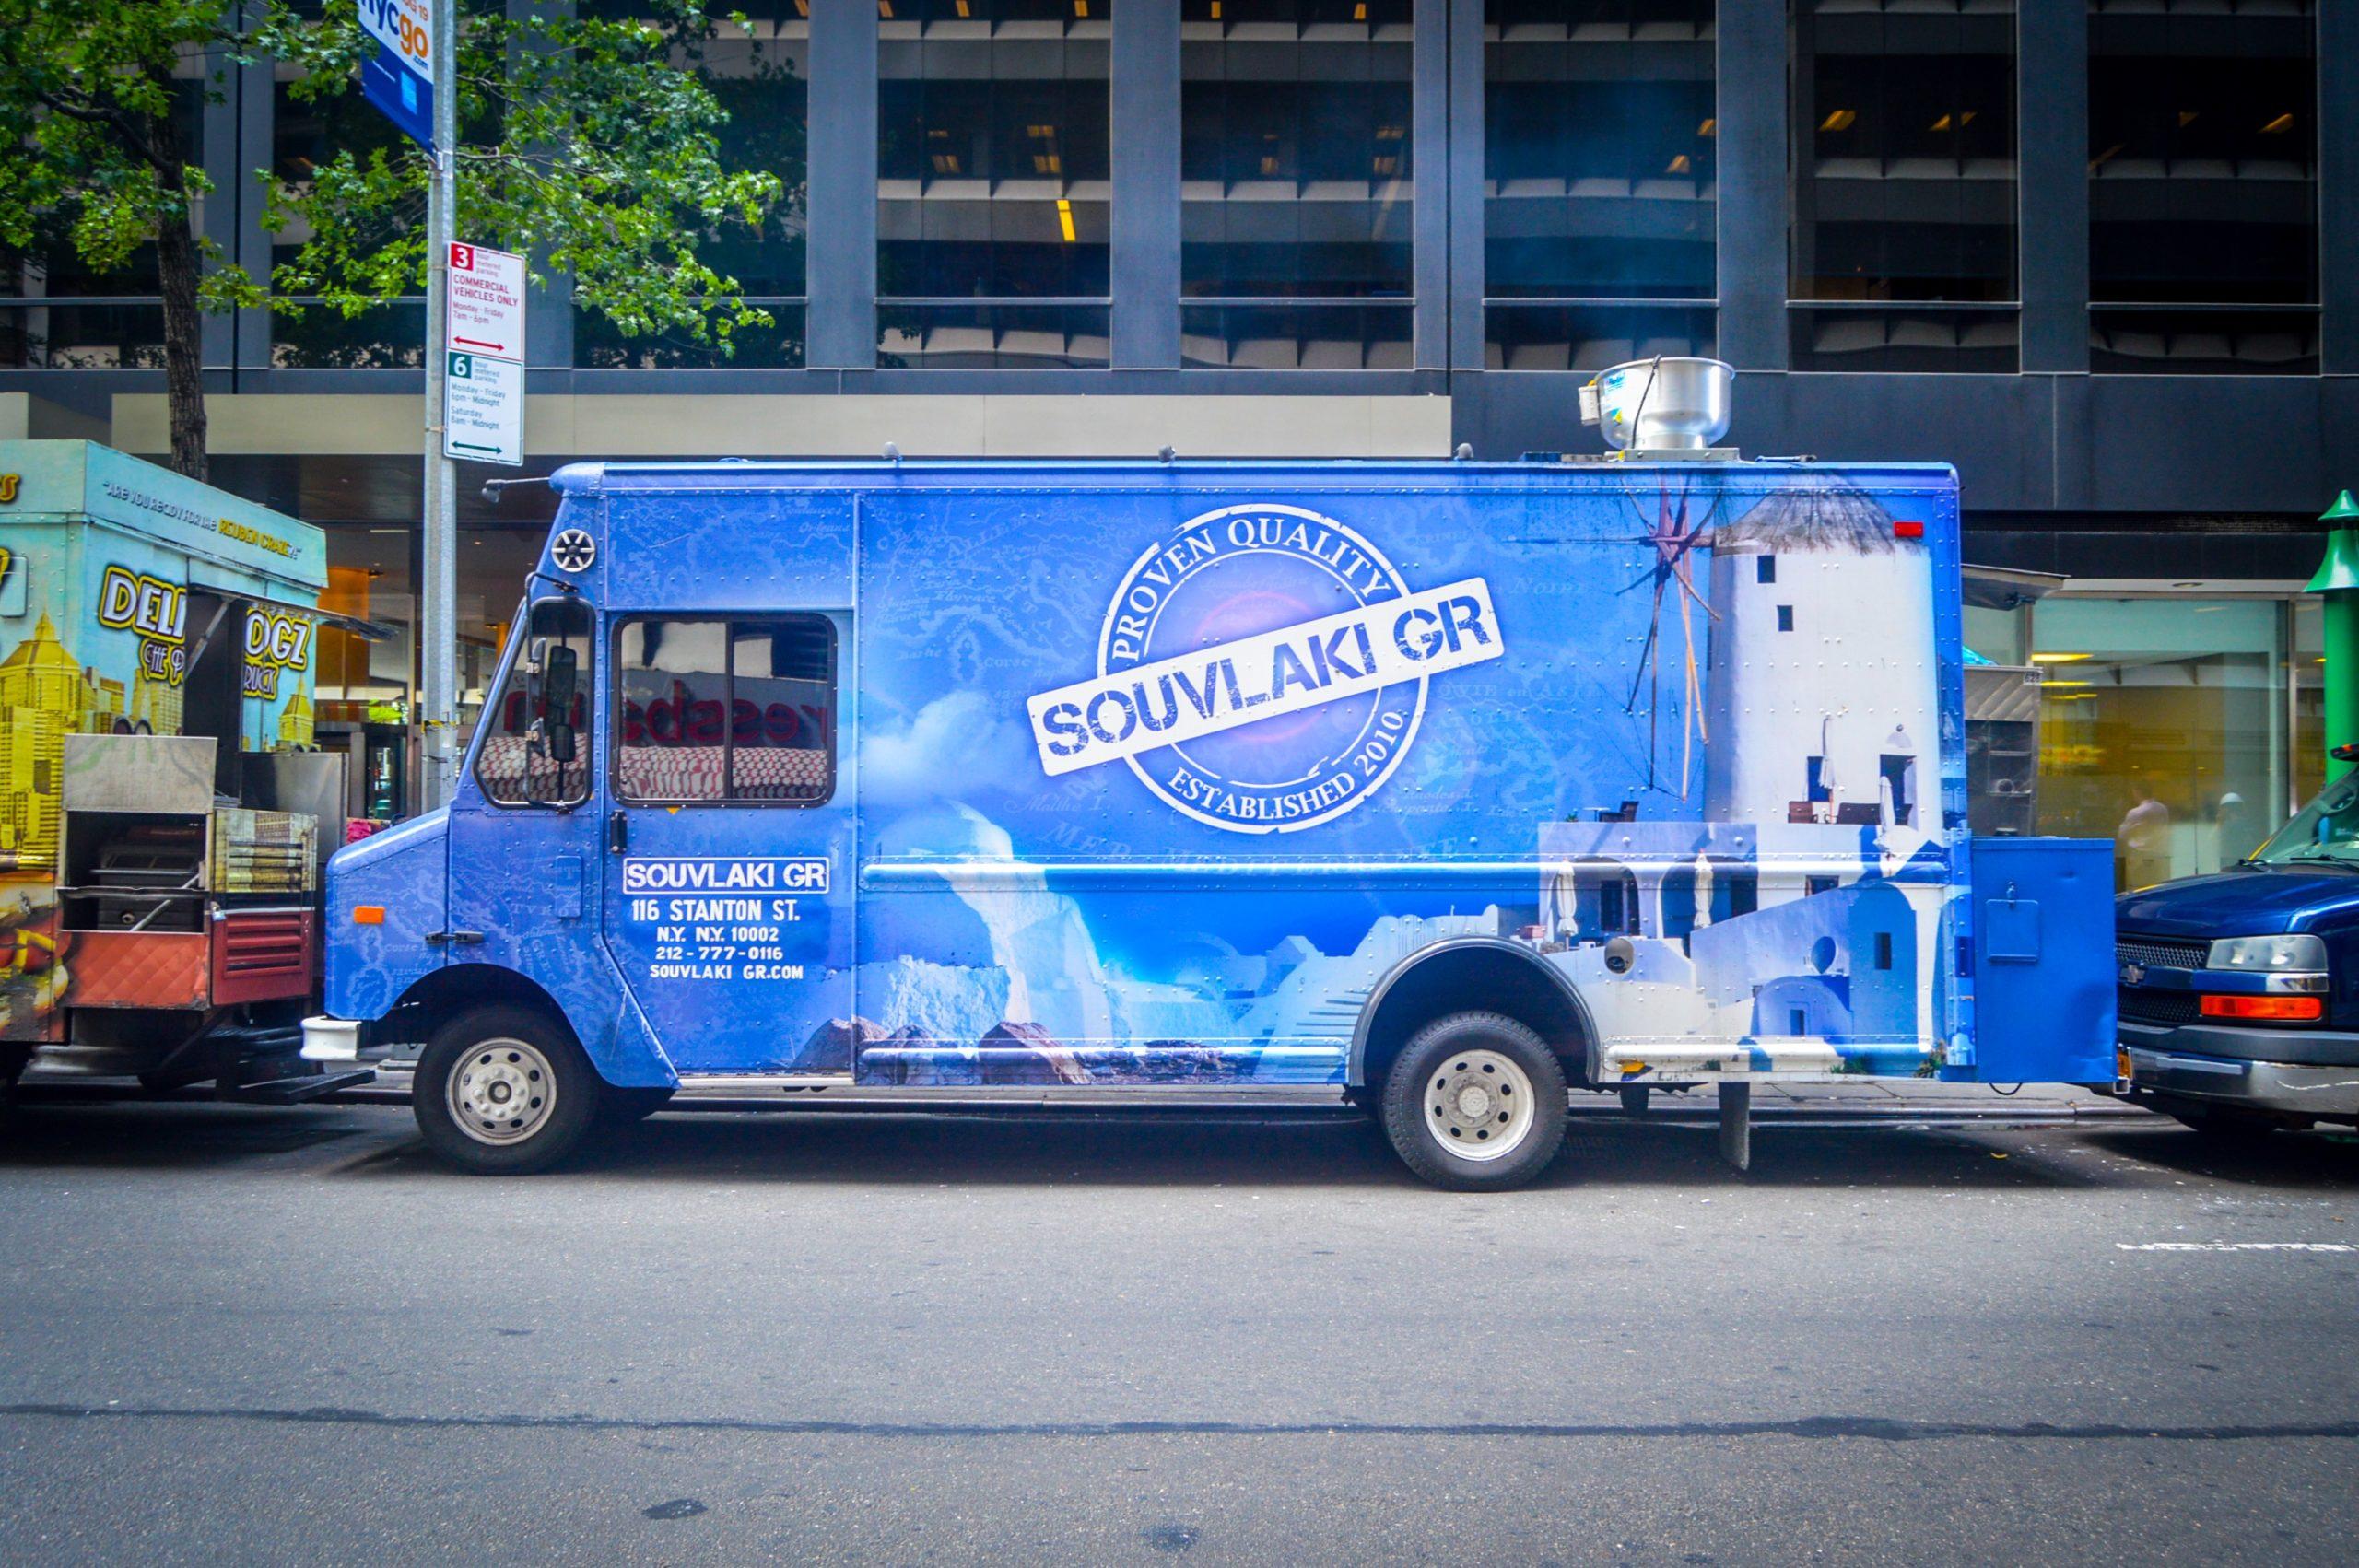 souvlaki gr greek food truck catering new york